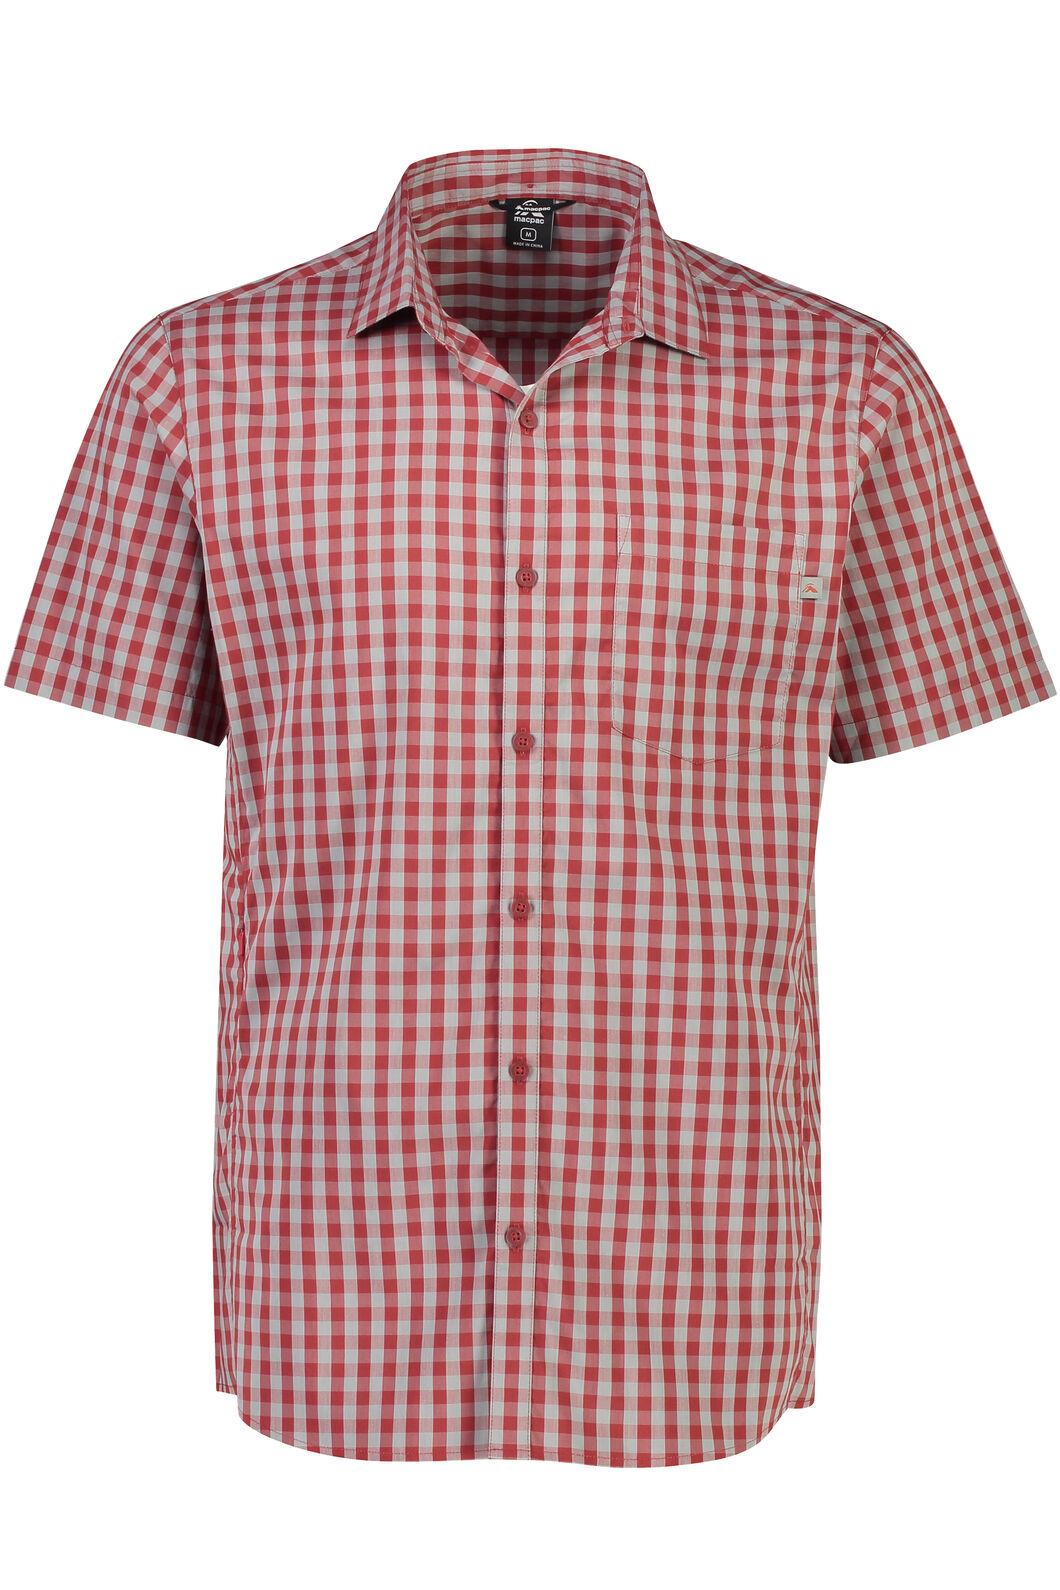 Crossroad Short Sleeve Shirt - Men's, Sundried Tomato, hi-res